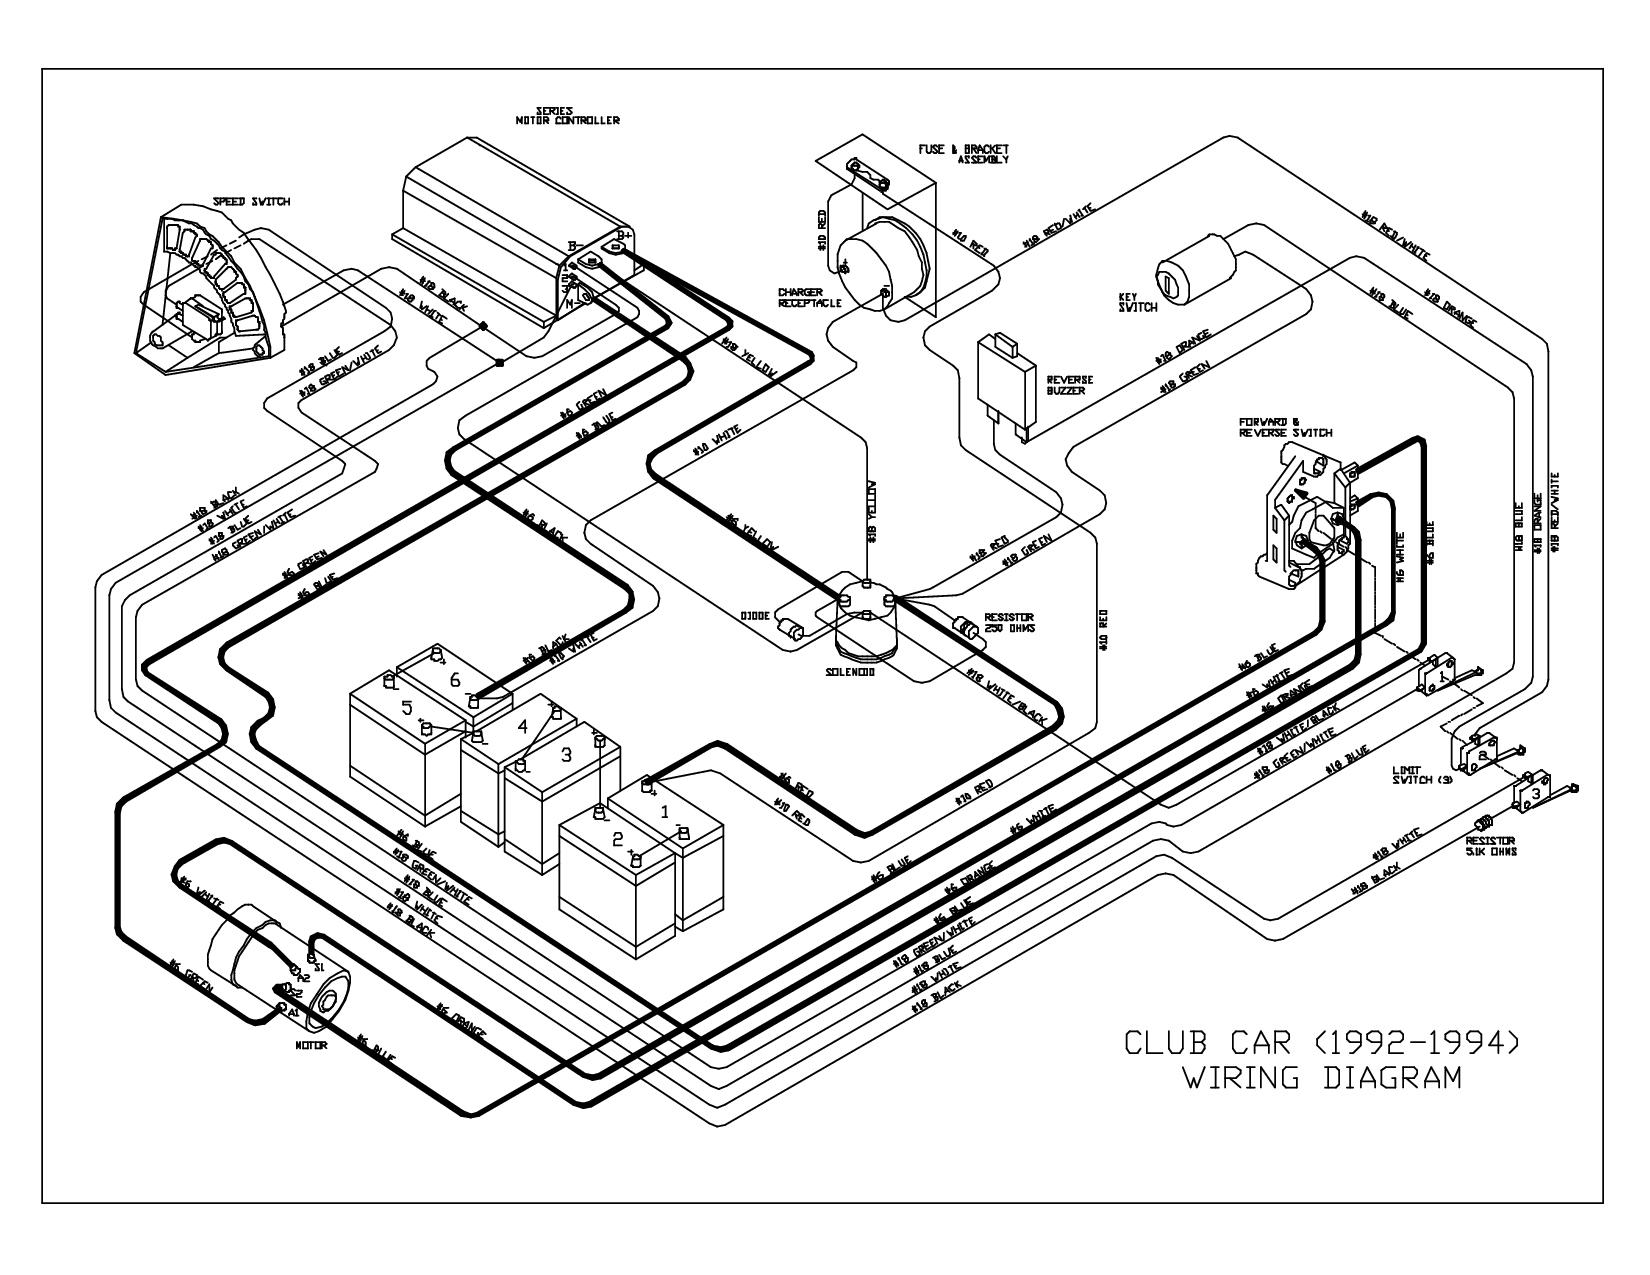 Golf Cart Wiring Diagram Club Car In 36 Volt And Jpg With Club Car - Club Car Wiring Diagram 36 Volt